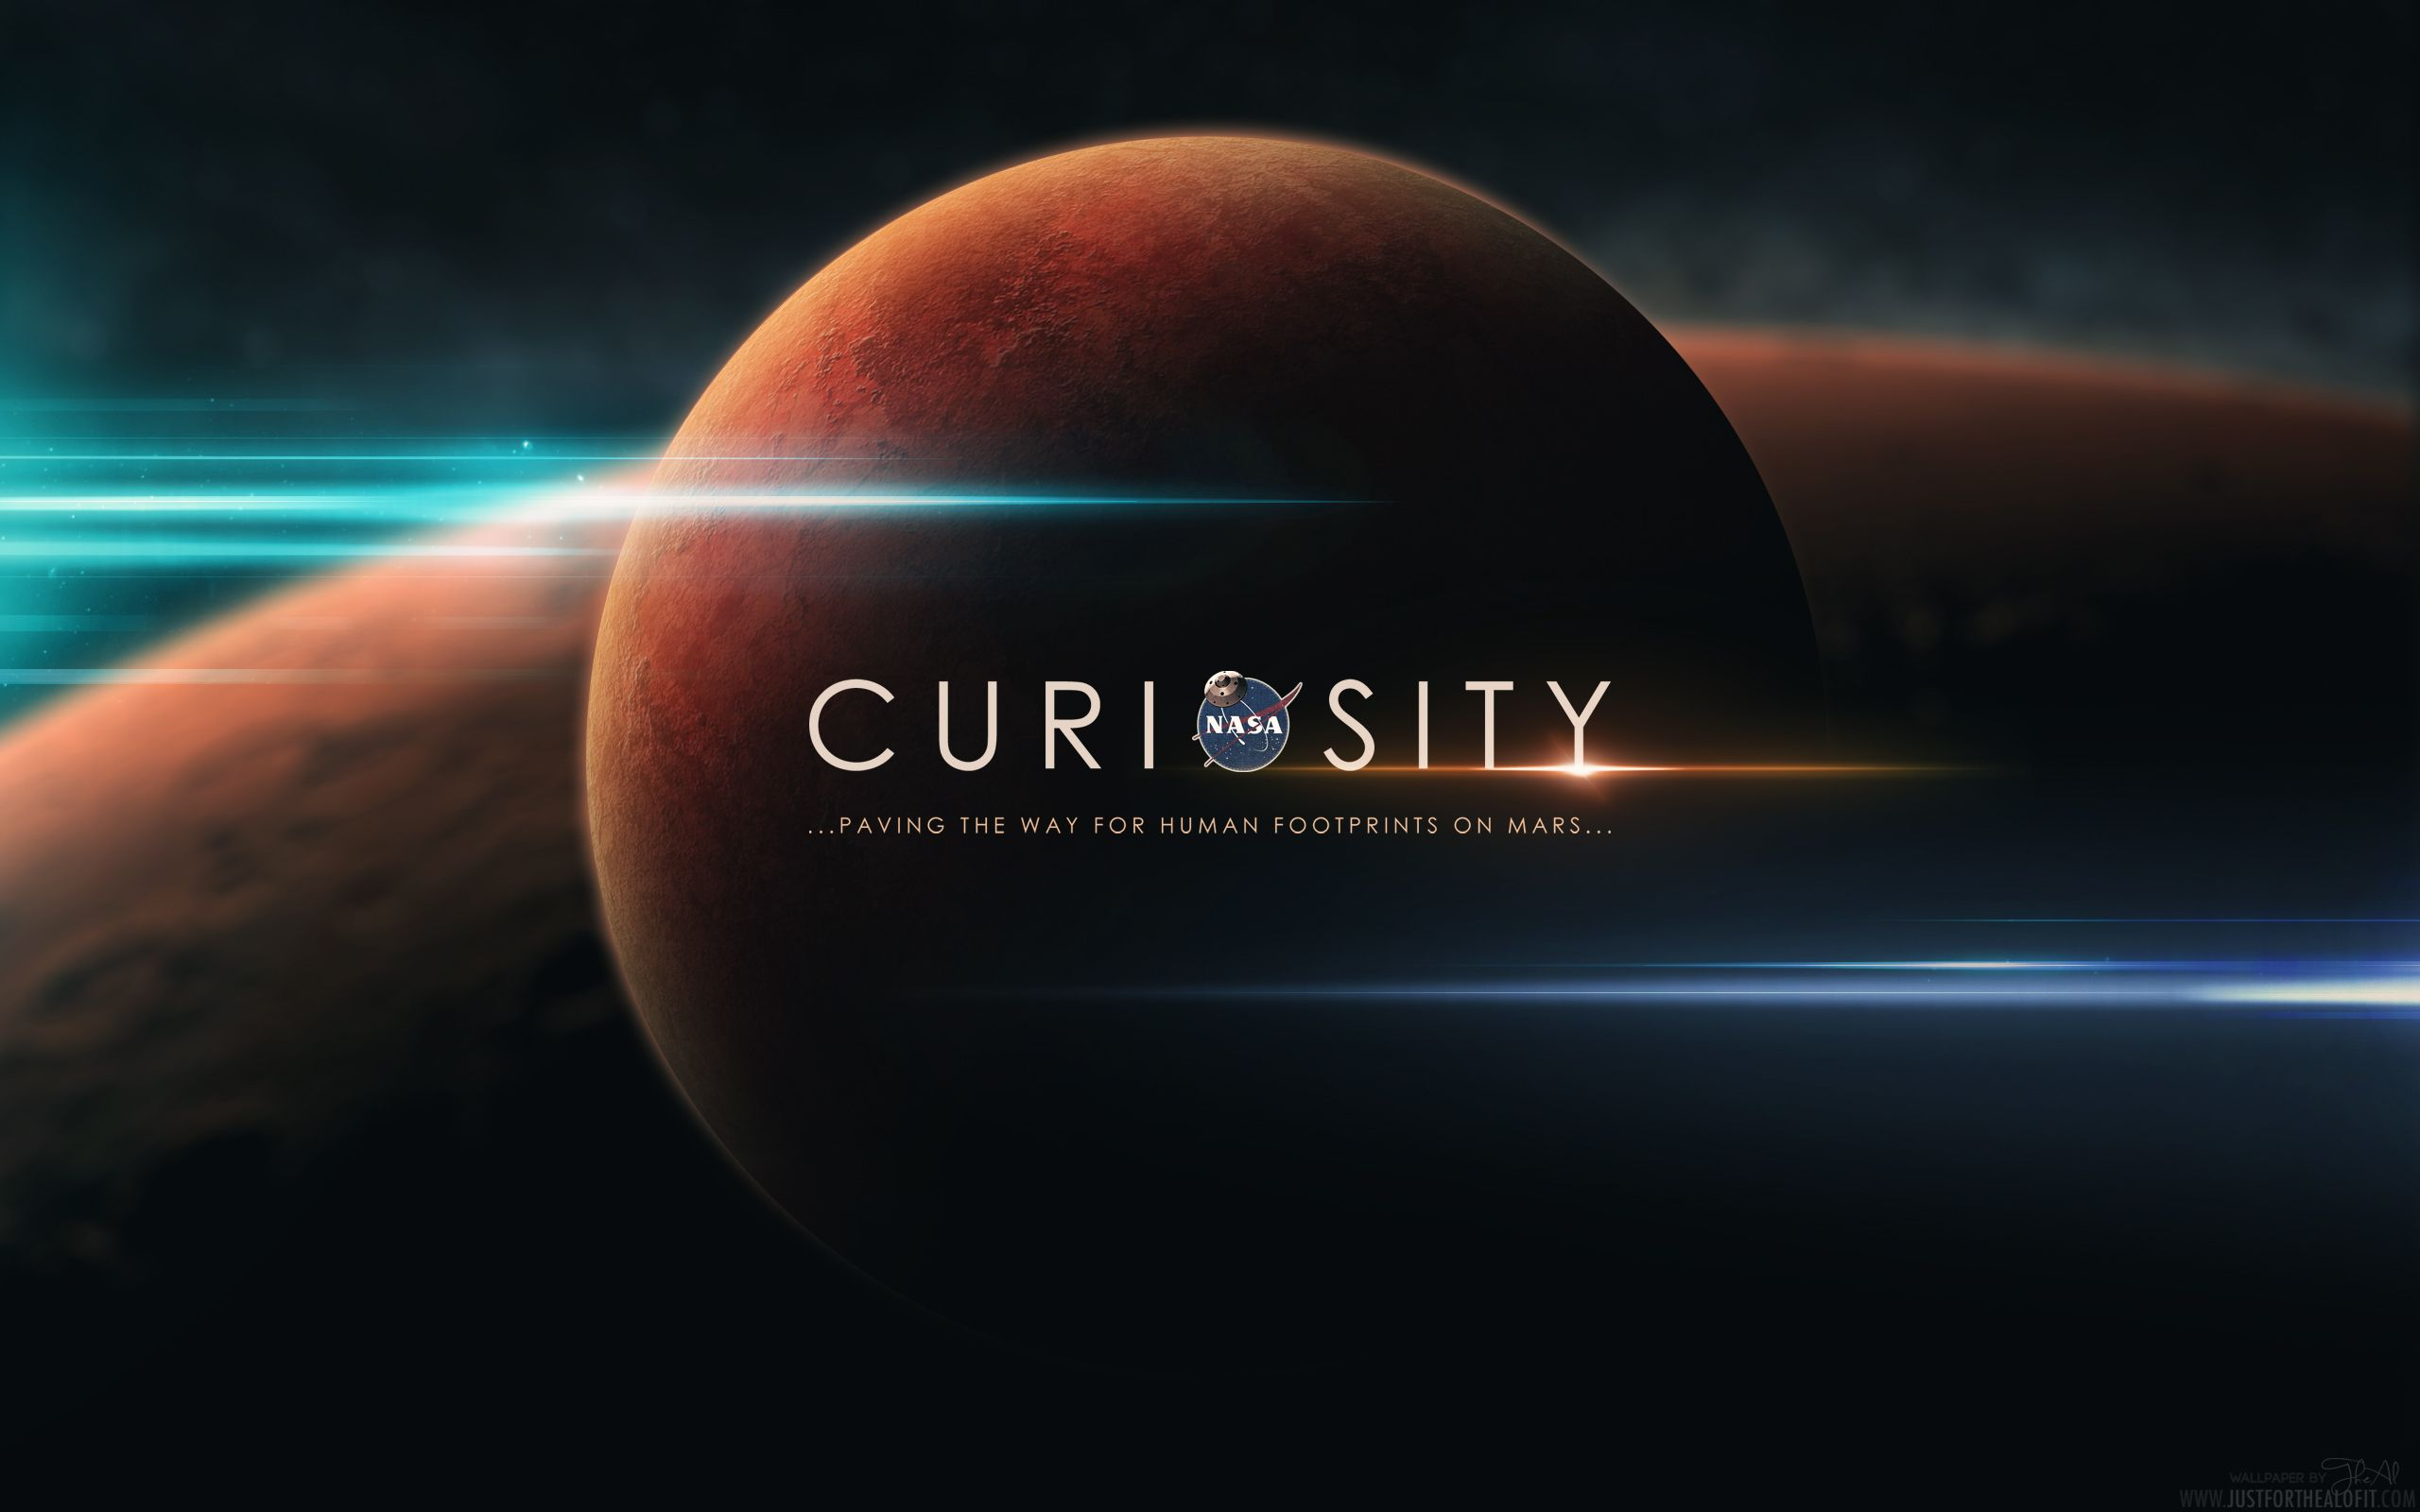 Nasa Mars Curiosity Http Www Pixel4k Com Nasa Mars Curiosity 6586 Html Curiosity Mars Nasa Sombrero Nasa Wallpaper Mars Wallpaper Nasa Mars